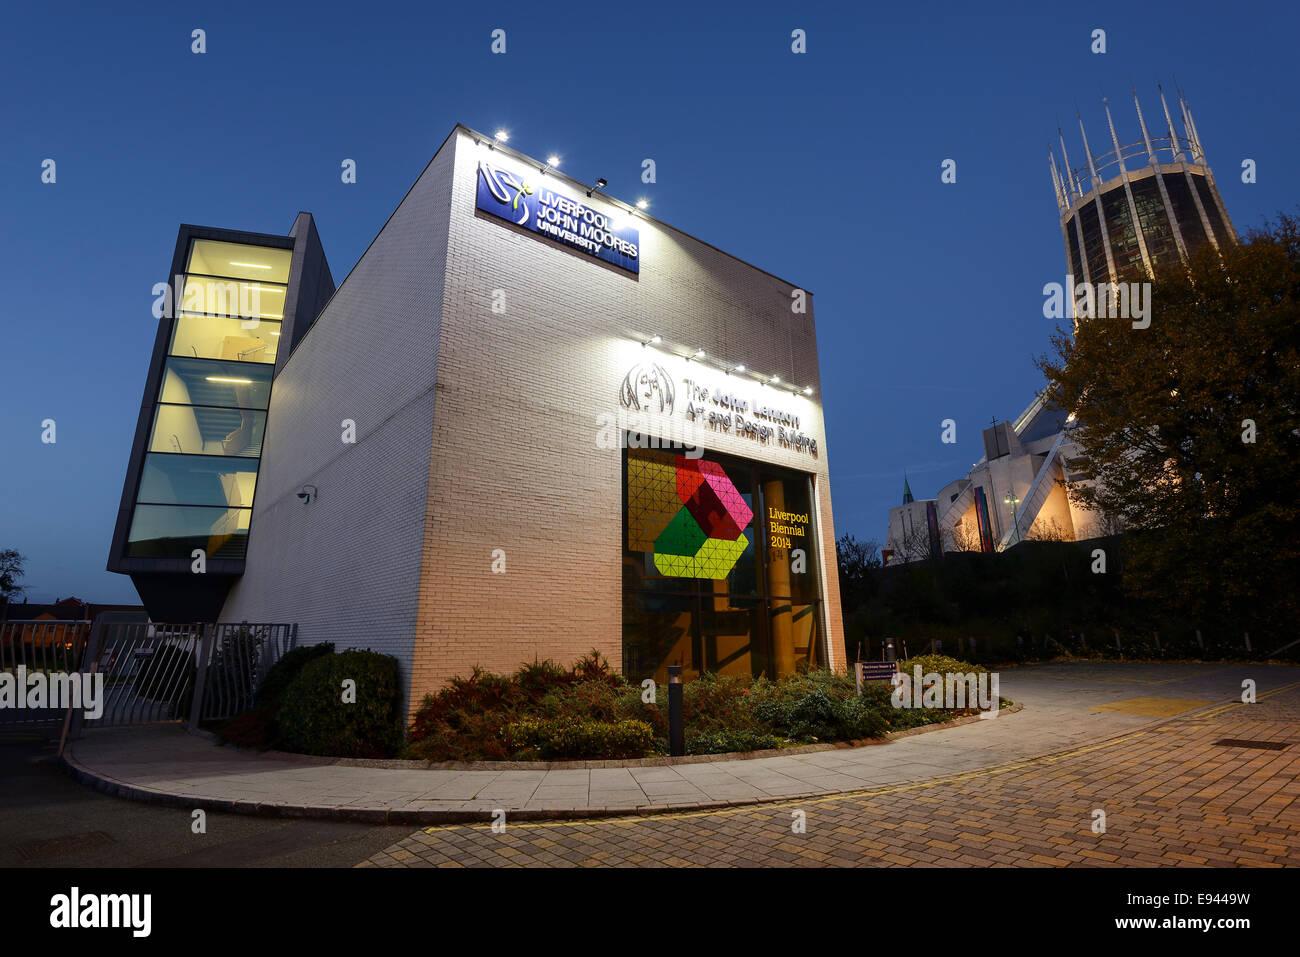 The John Lennon Art and Design Building Liverpool at John Moores University UK - Stock Image